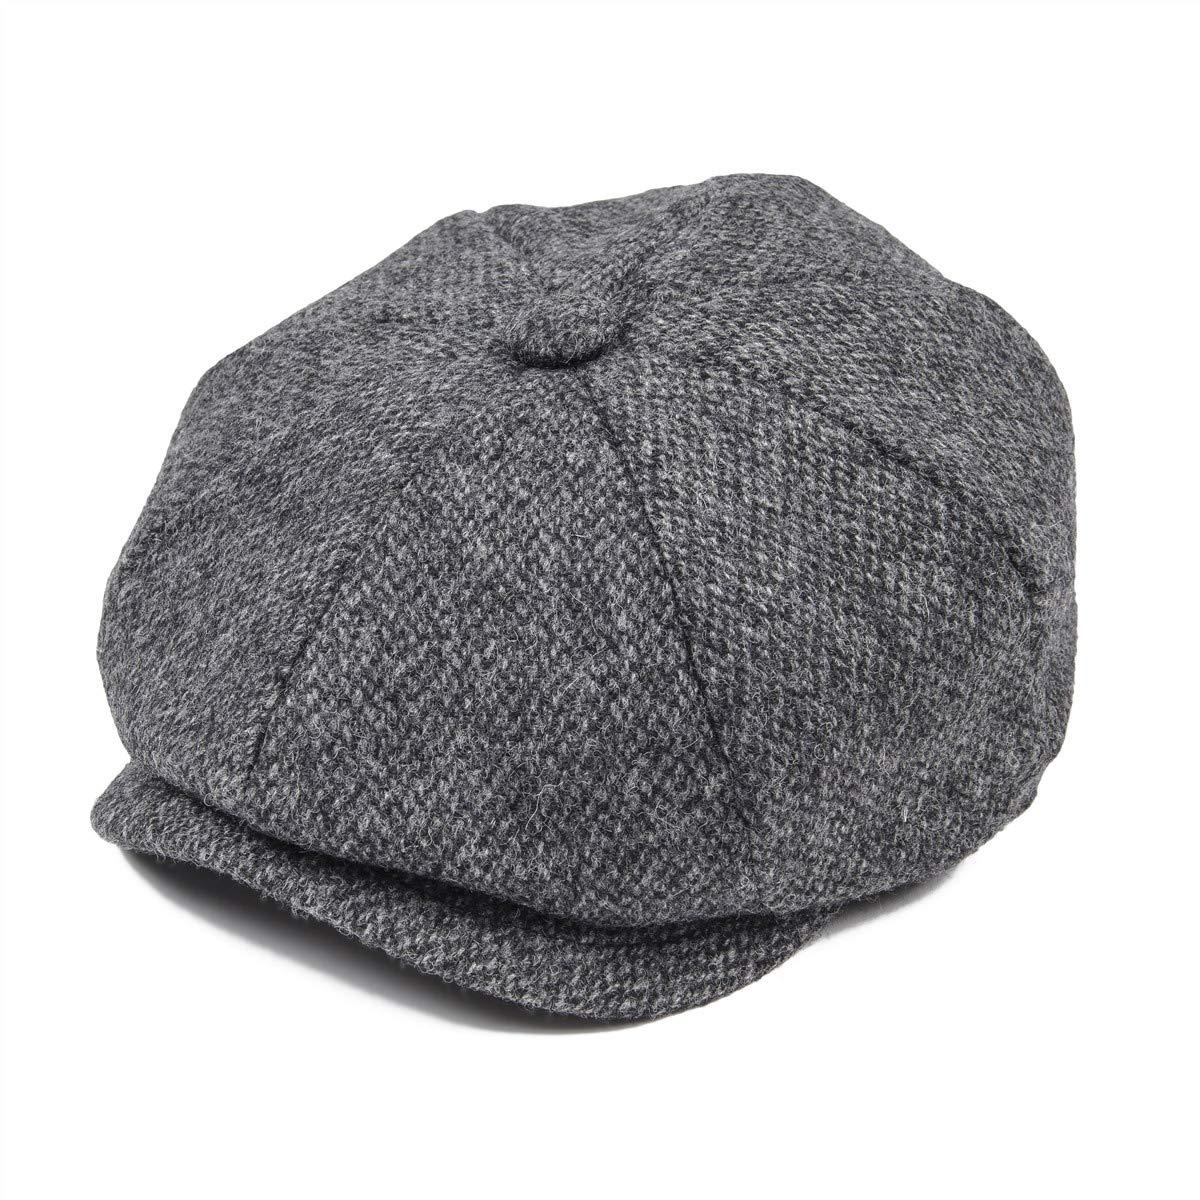 68719a092e5ab JANGOUL Mens 100% Wool Newsboy Cap Grey Series 8 Panel Tweed Cabbie Hat (S